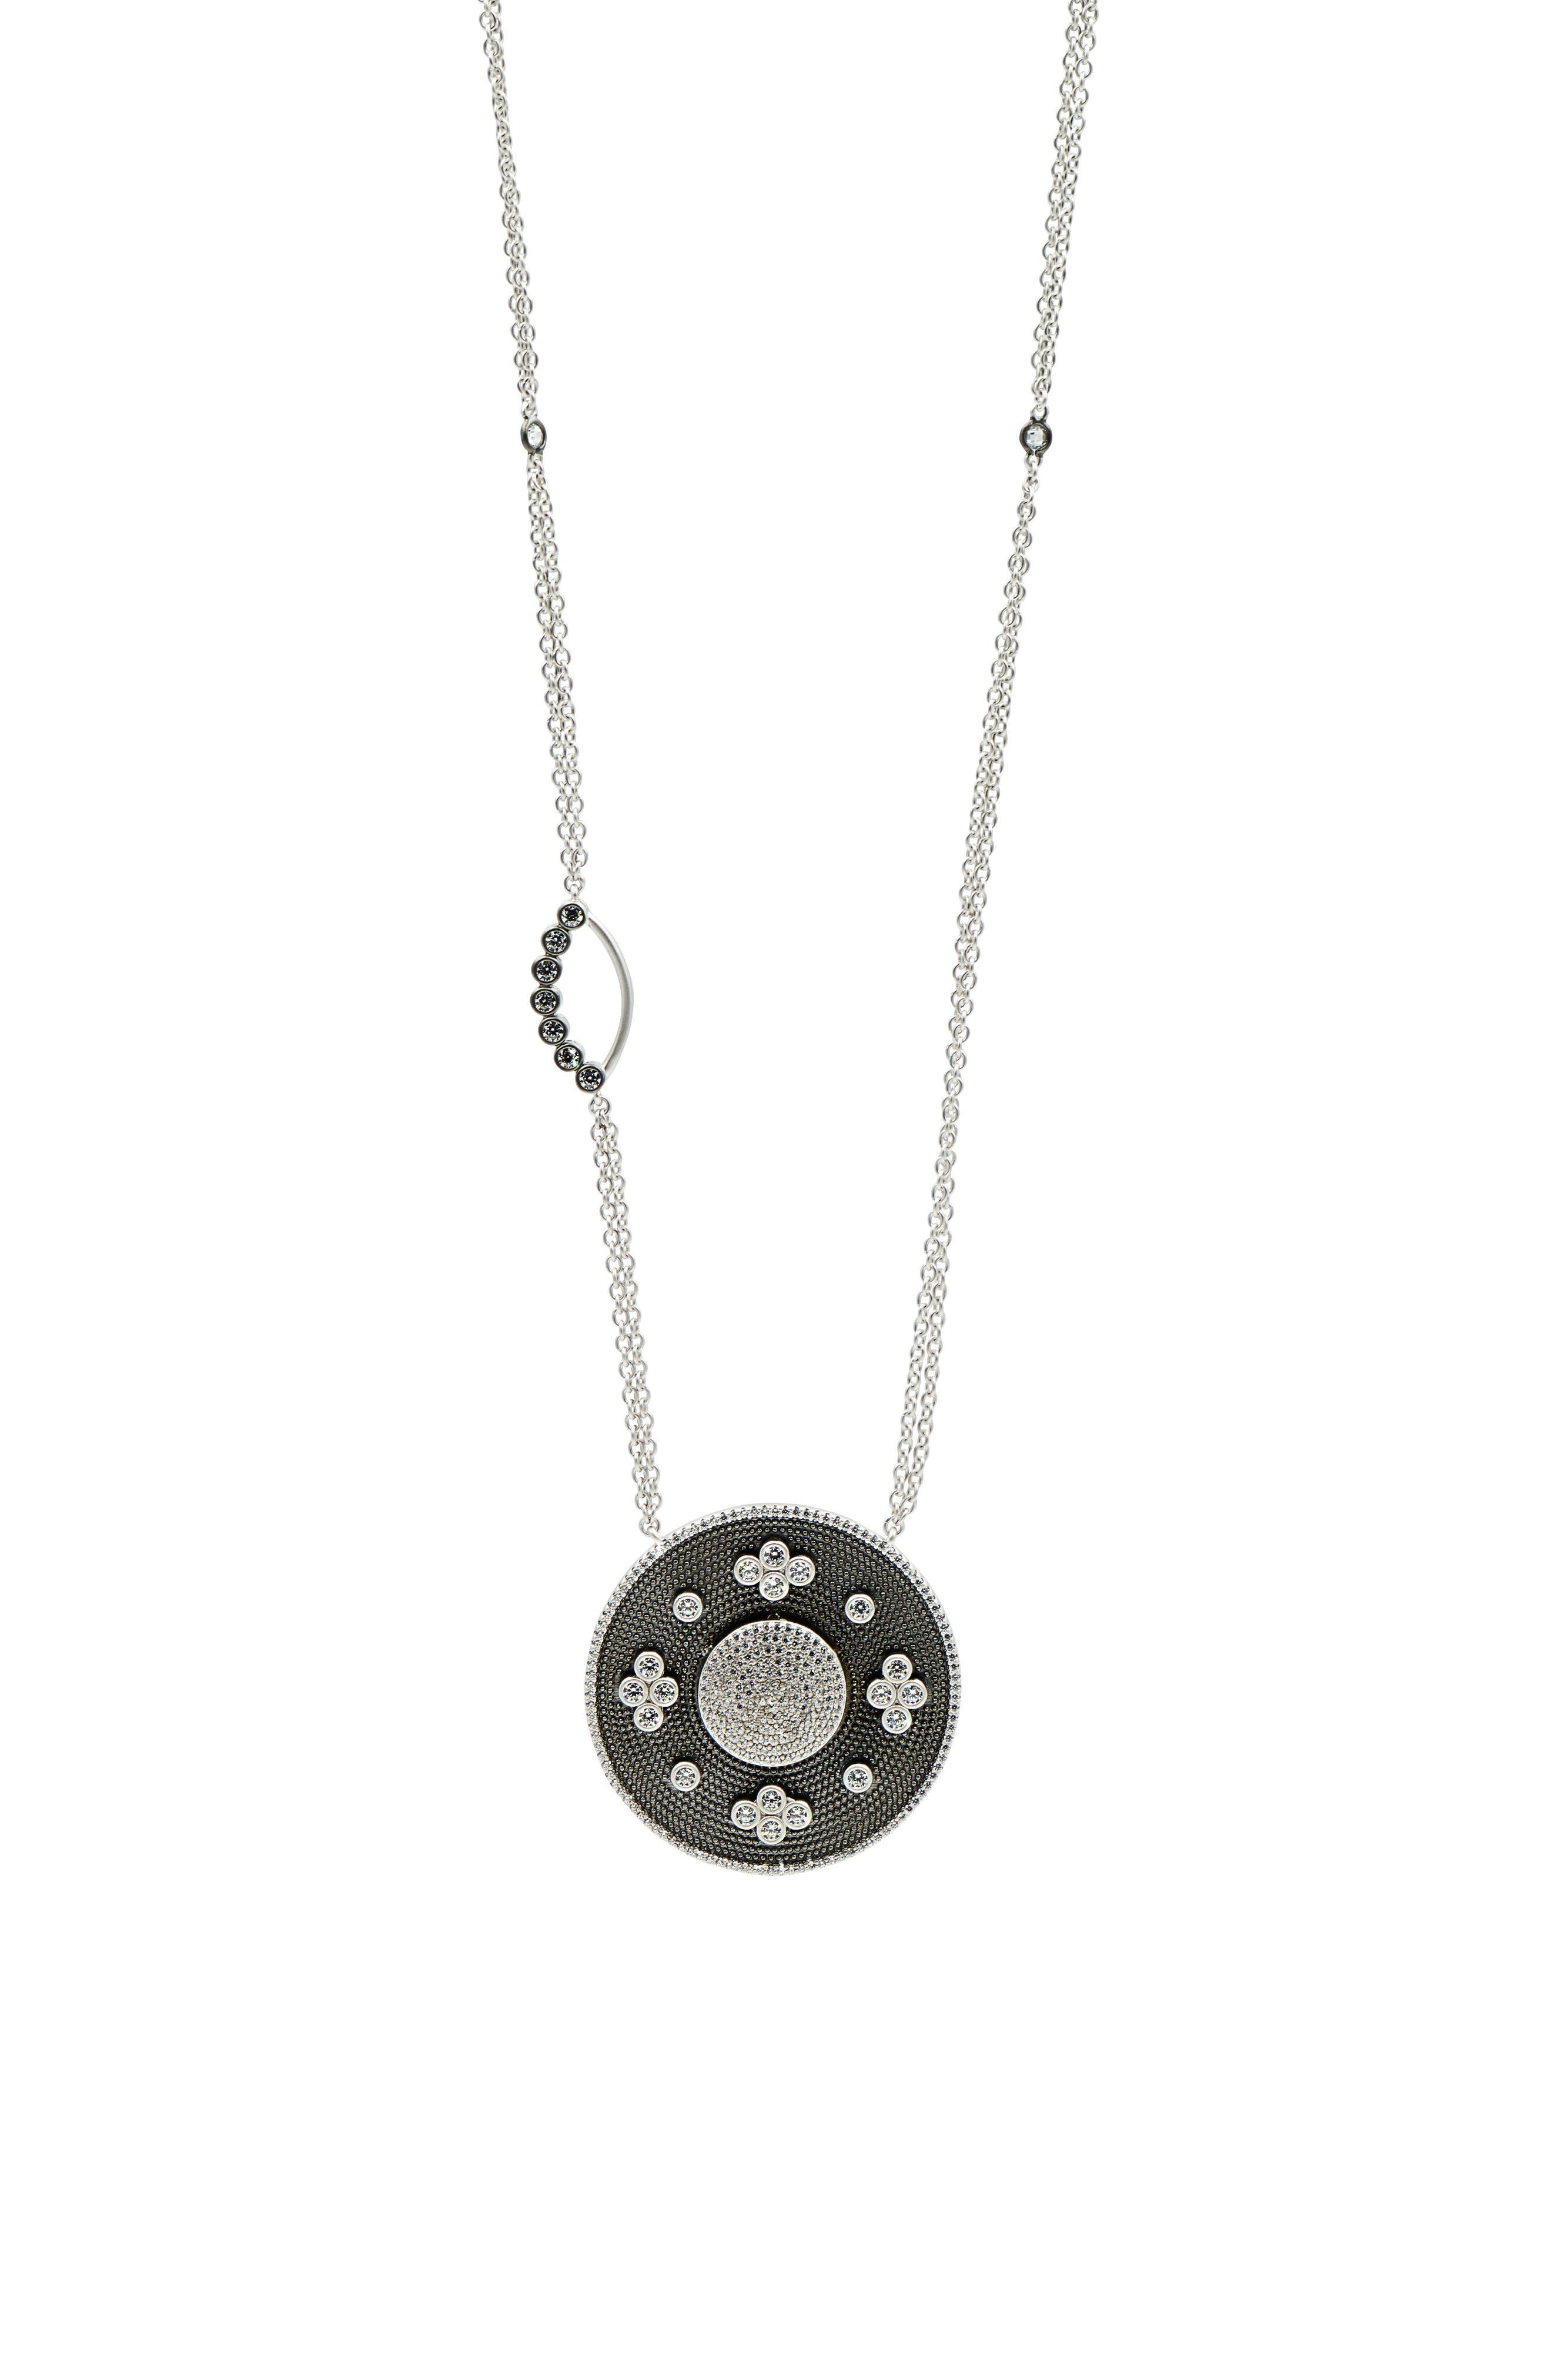 Industrial Finish Pendant Necklace,                             Main thumbnail 1, color,                             BLACK/ SILVER